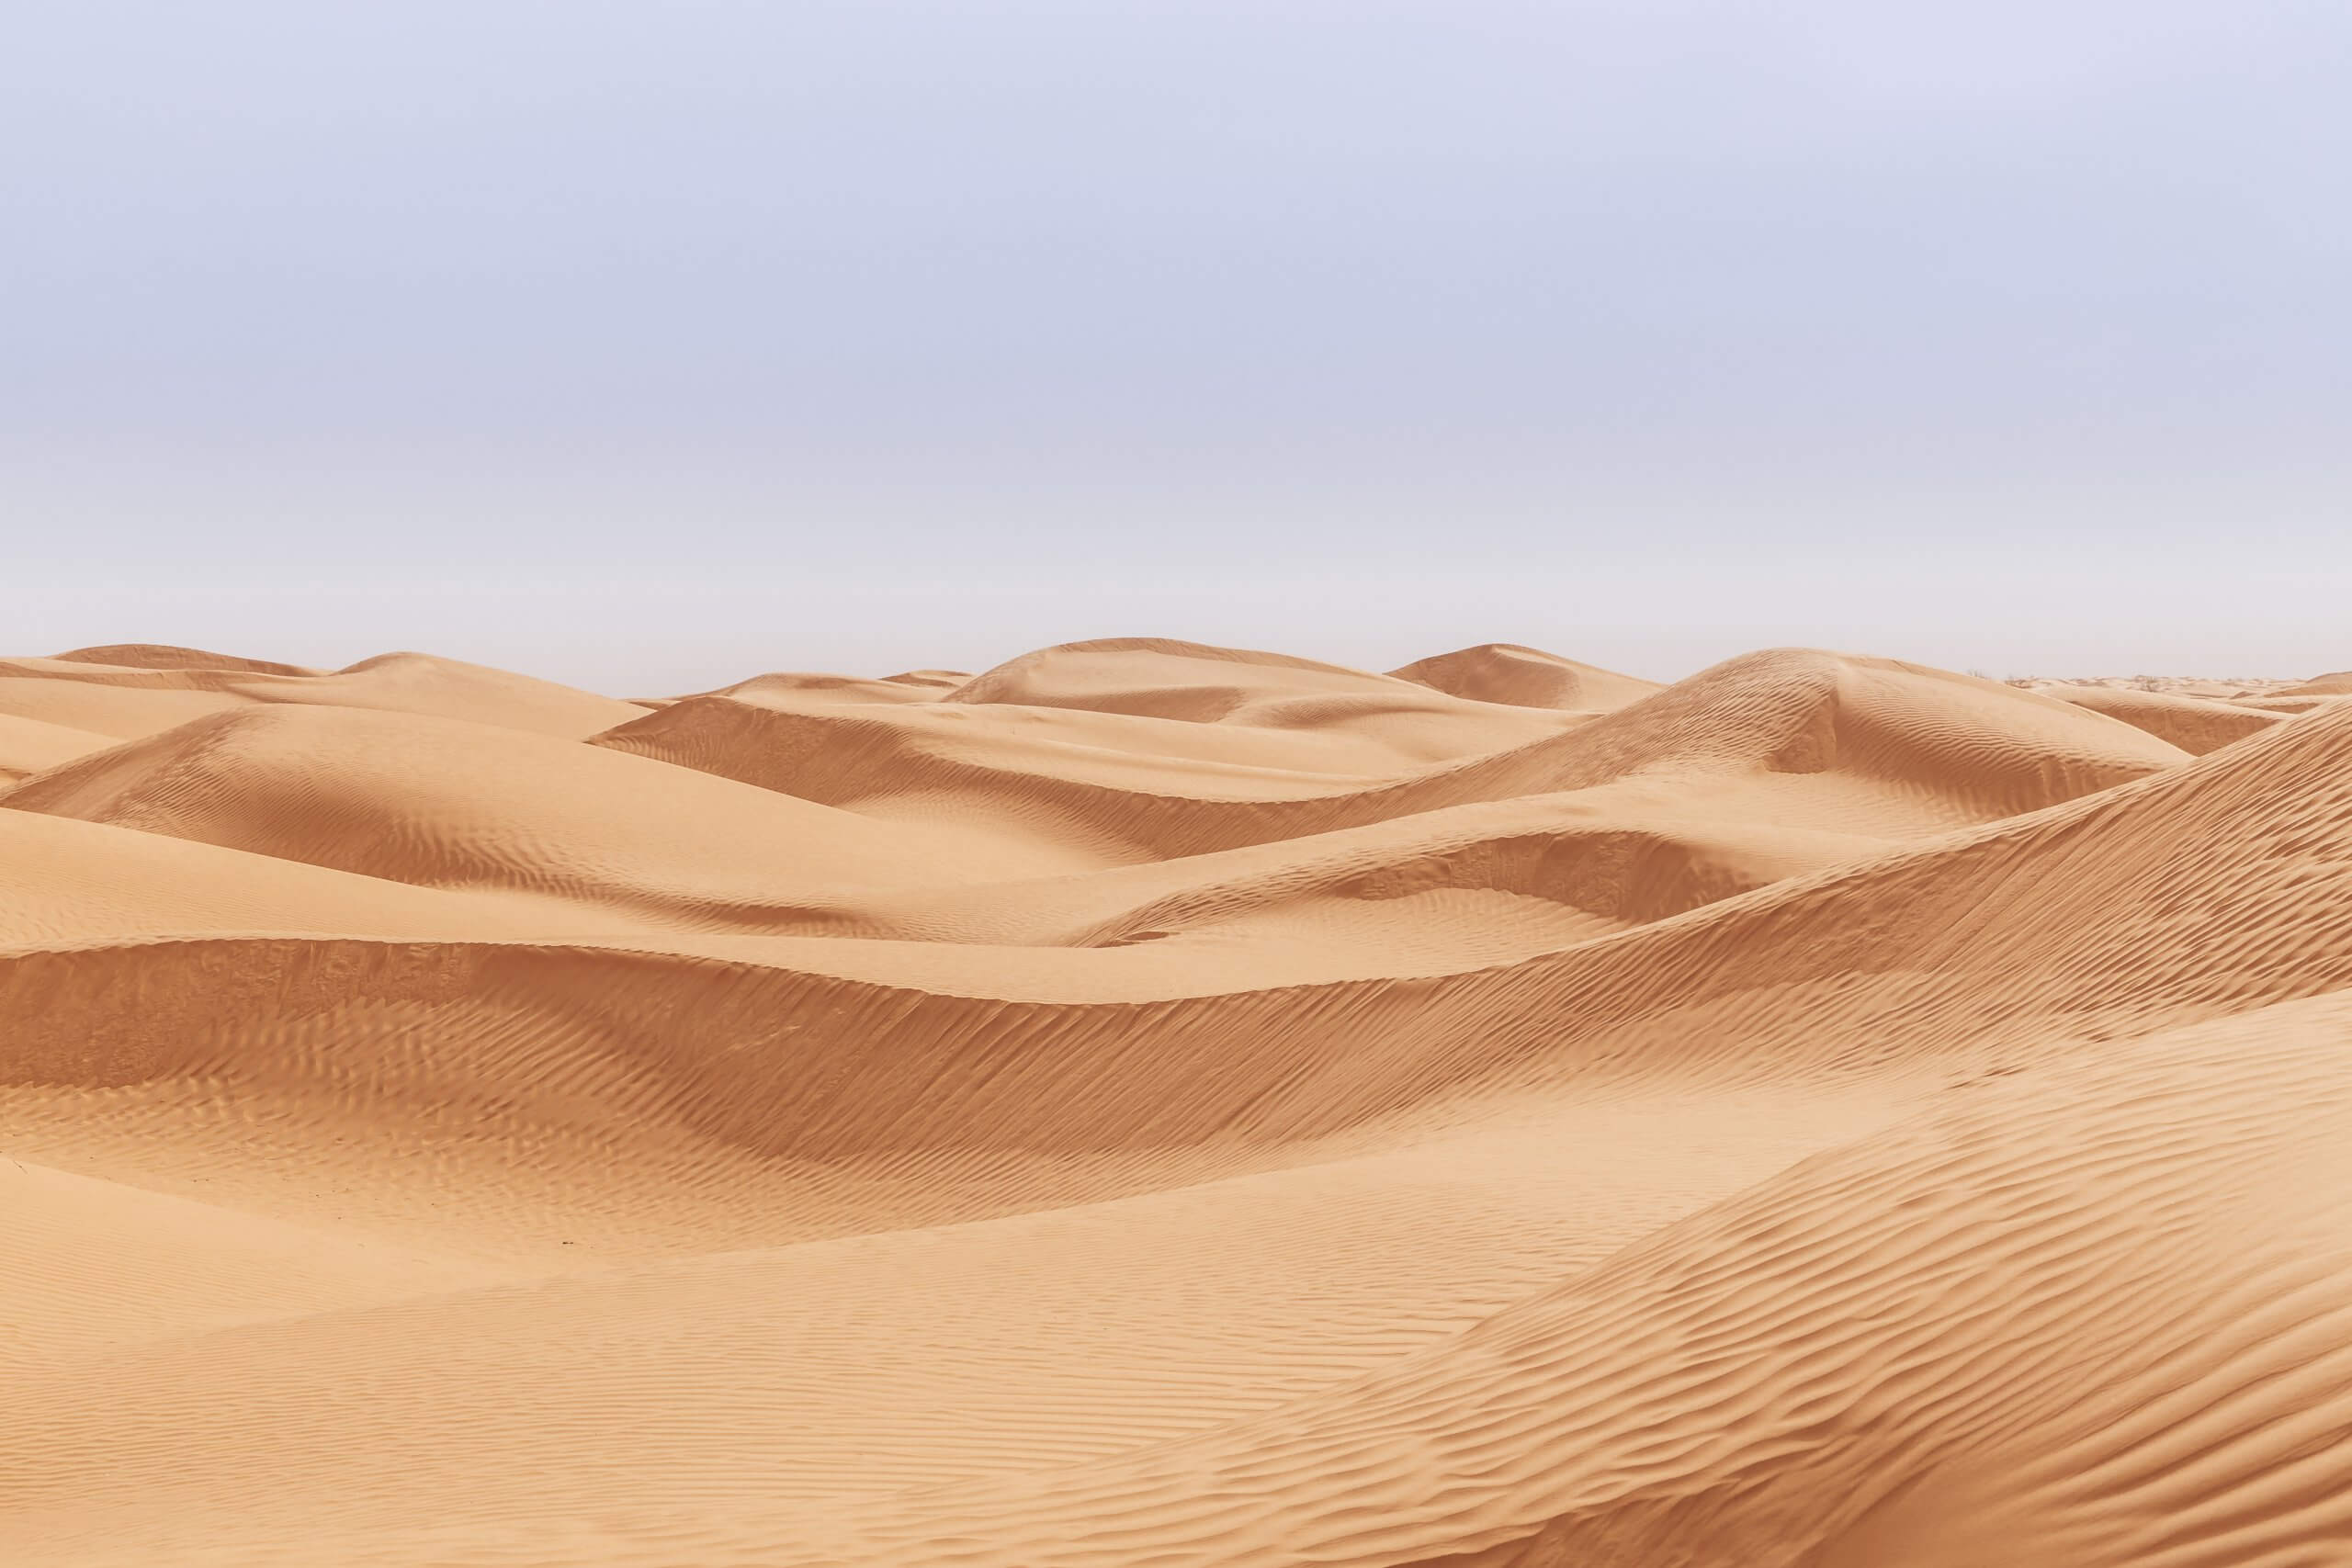 das endlose Sandmeer des Grand Erg Oriental